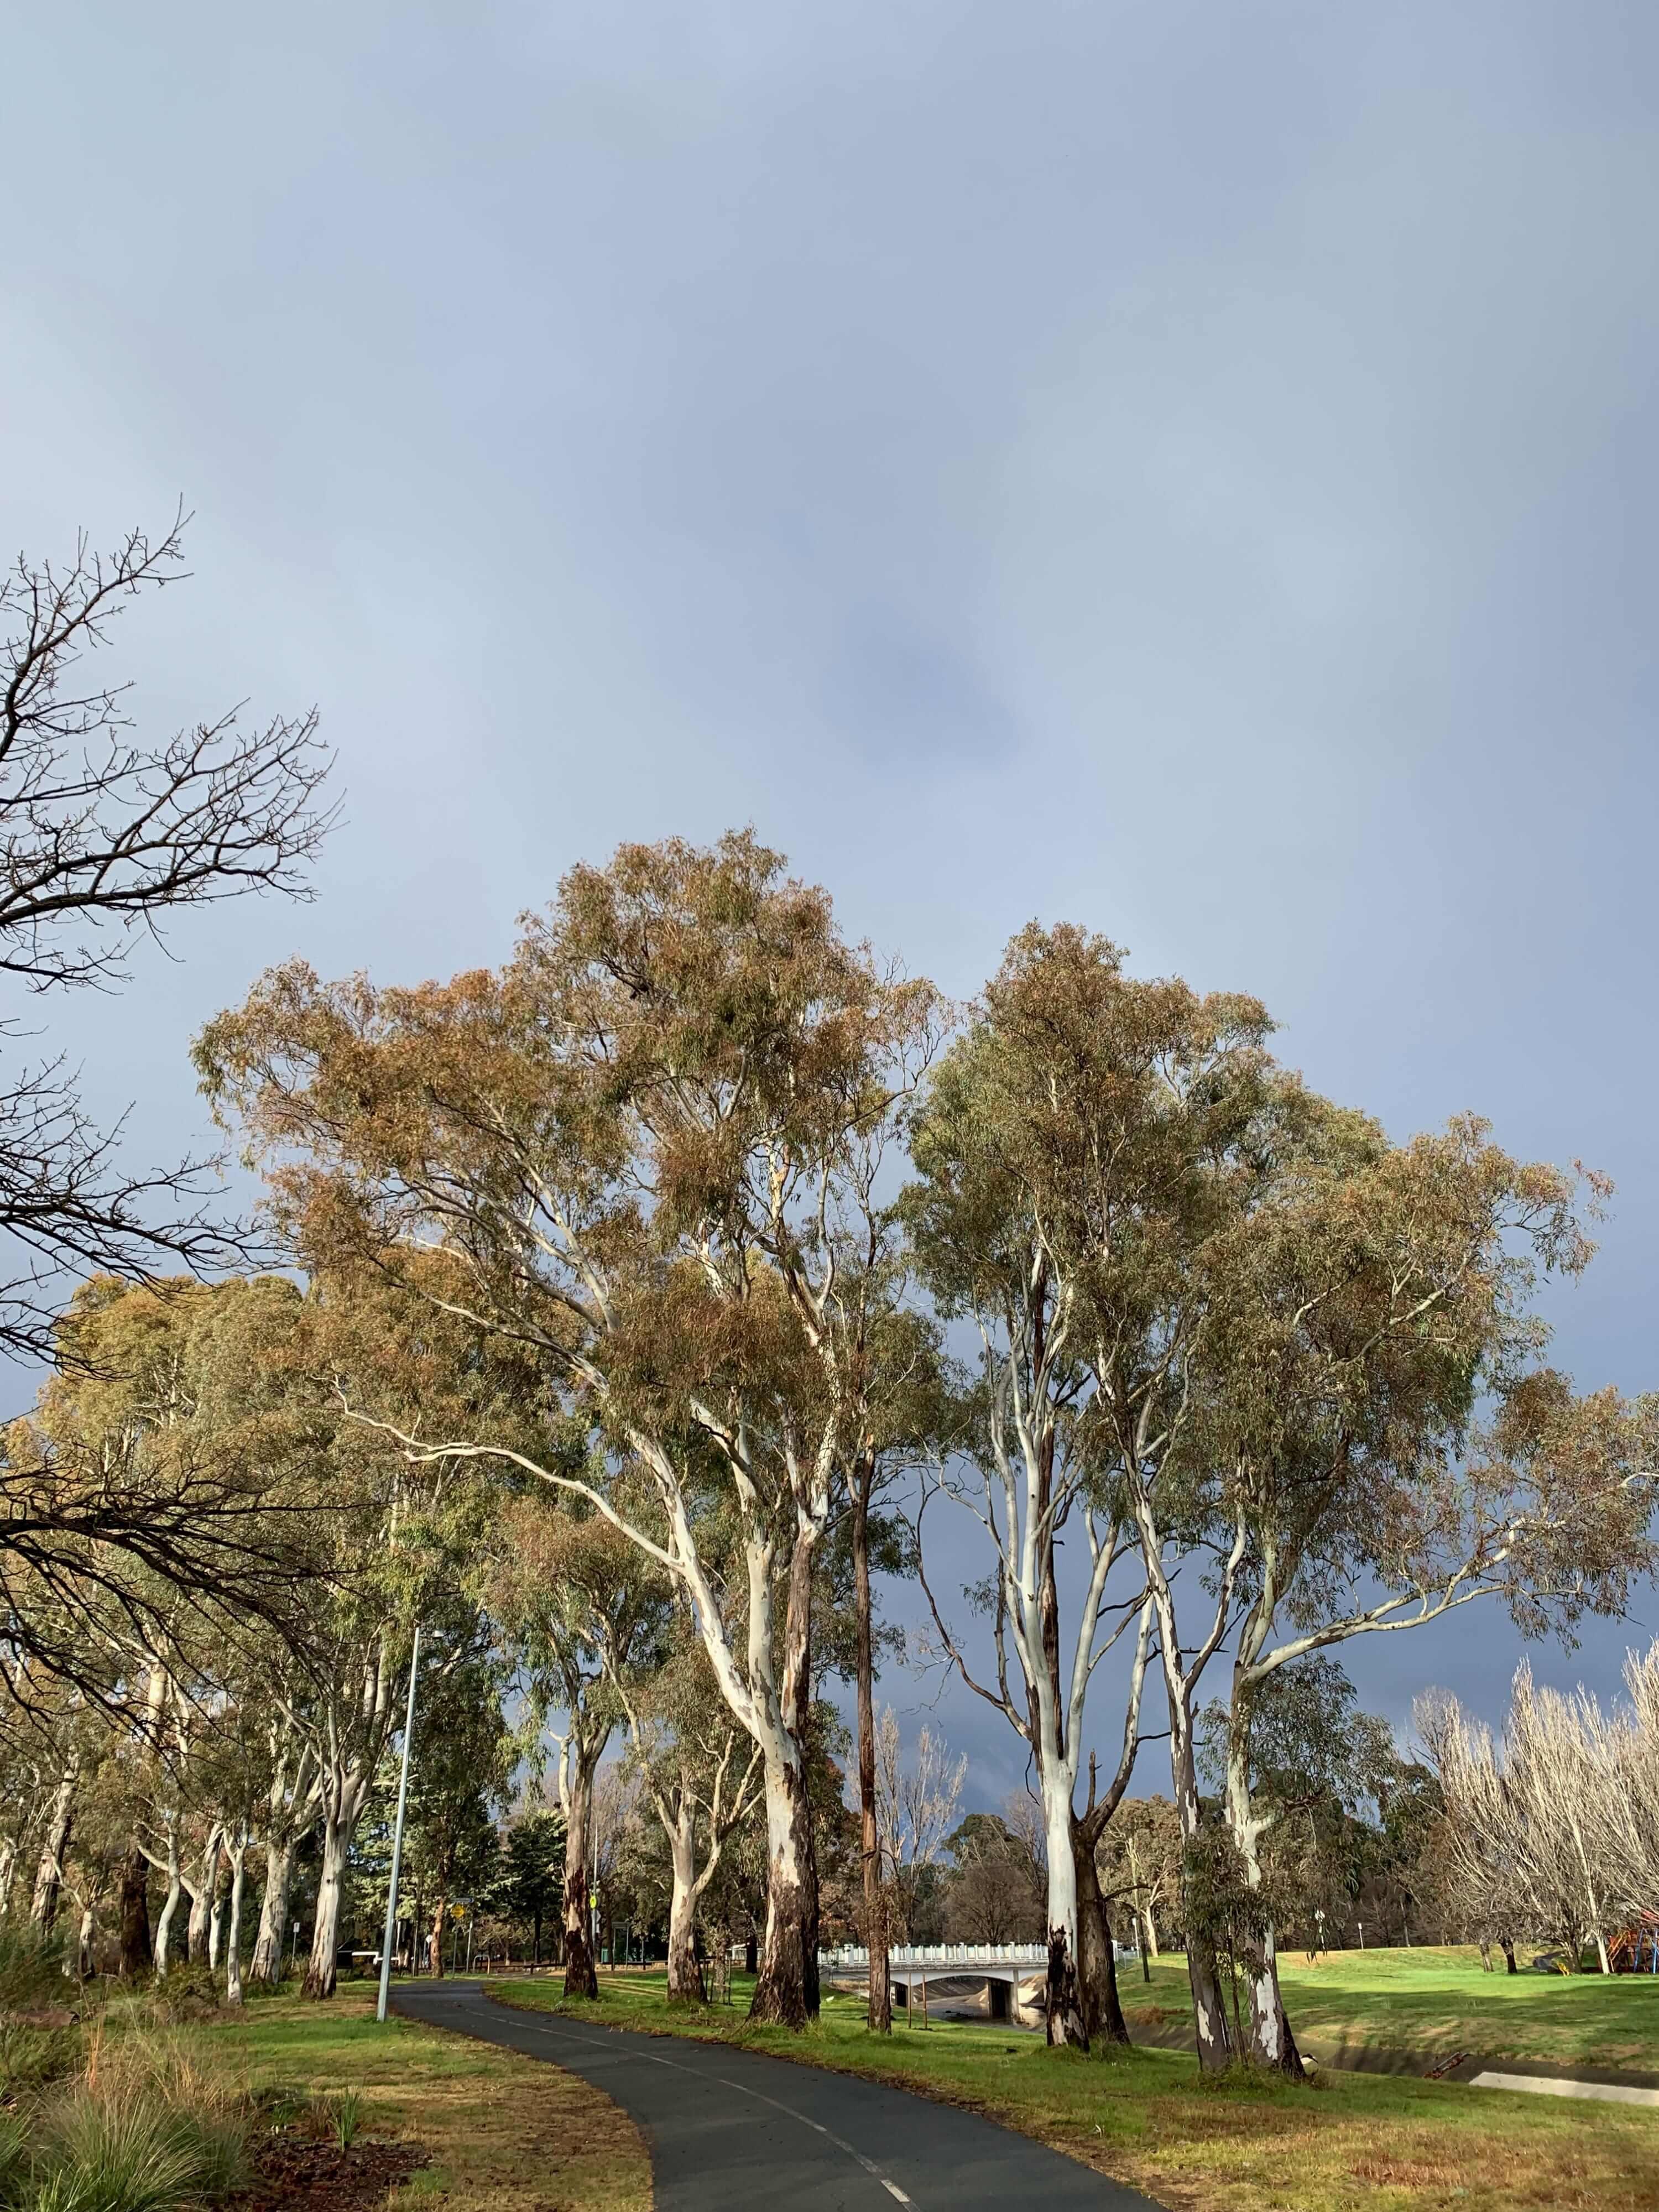 eucalyptus trees with the morning sun shining on them